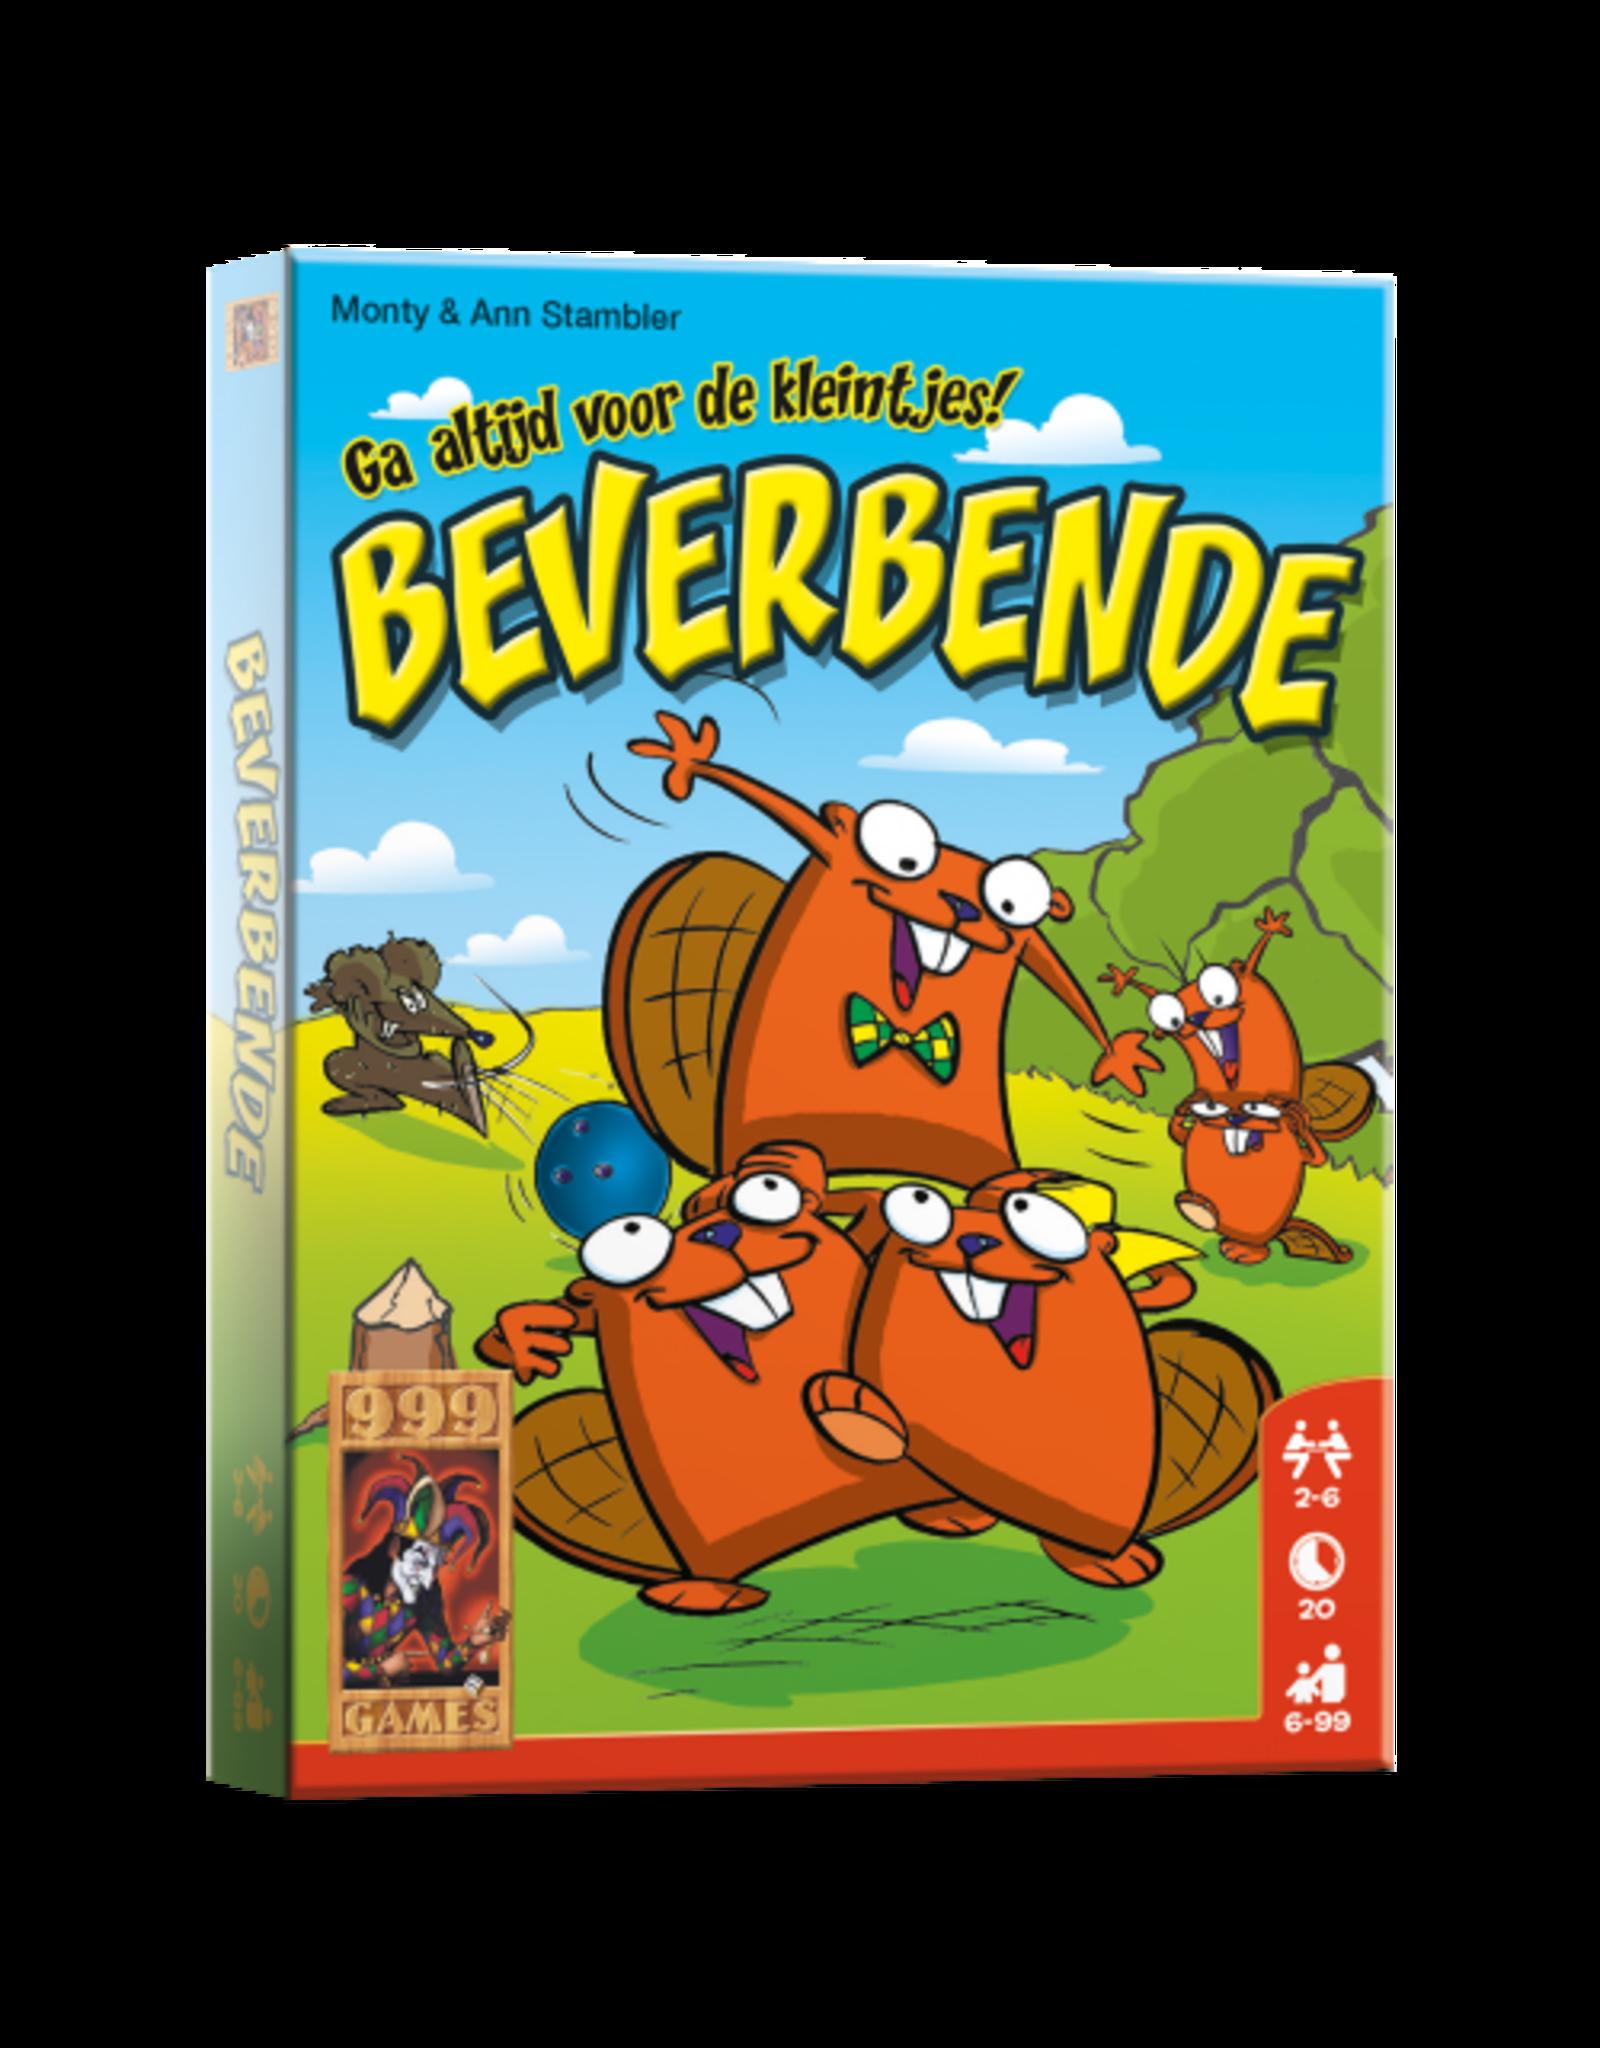 999 GAMES BEVERBENDE SPEL *NL